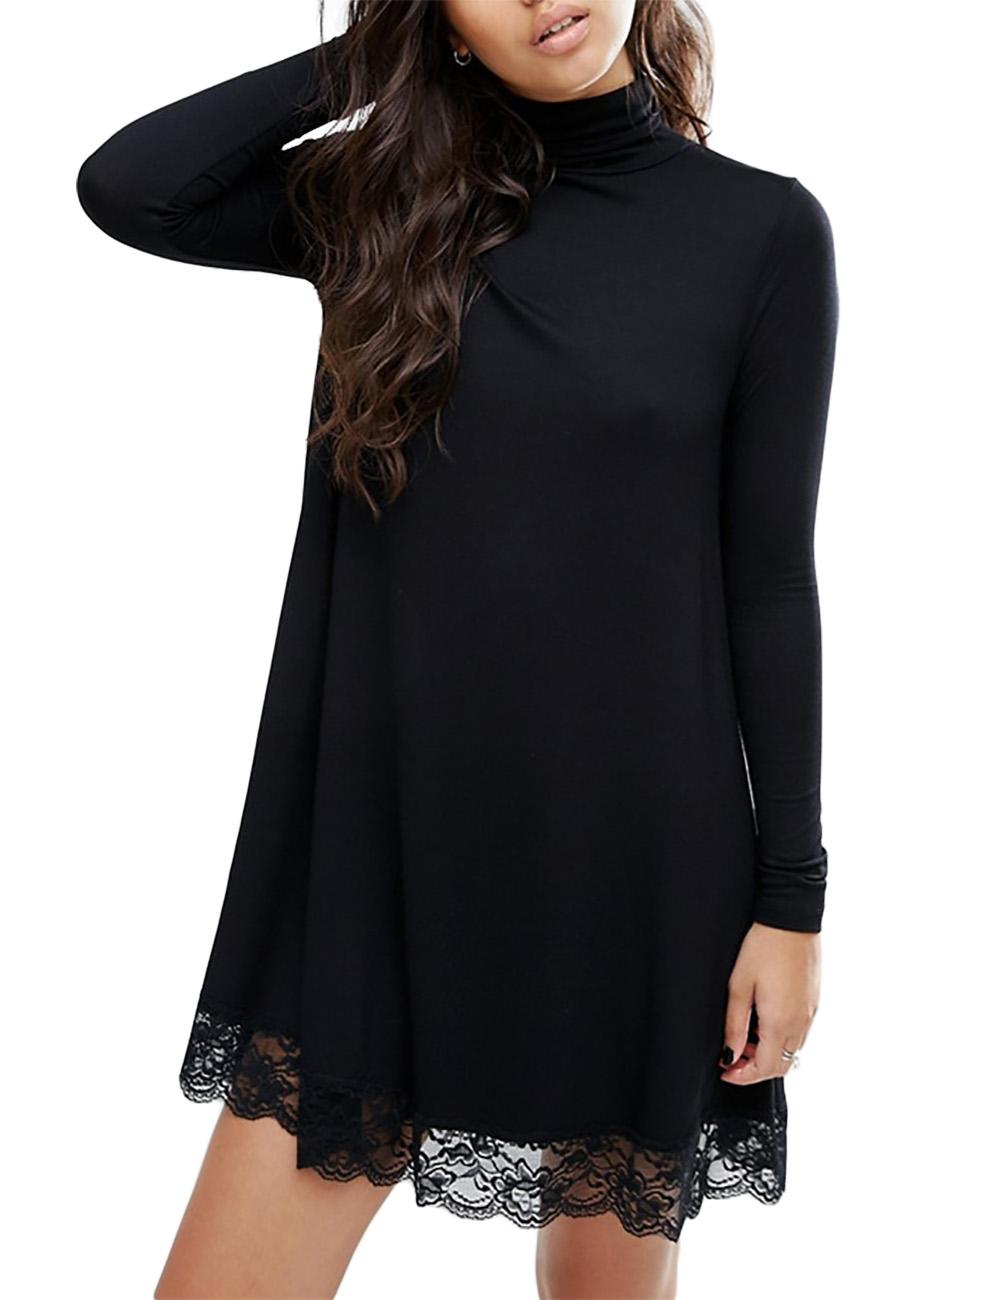 [US Direct] Leadingstar Women's Knitting Turtleneck Long Sleeve Loose Lace Cotton Casual Dress Black